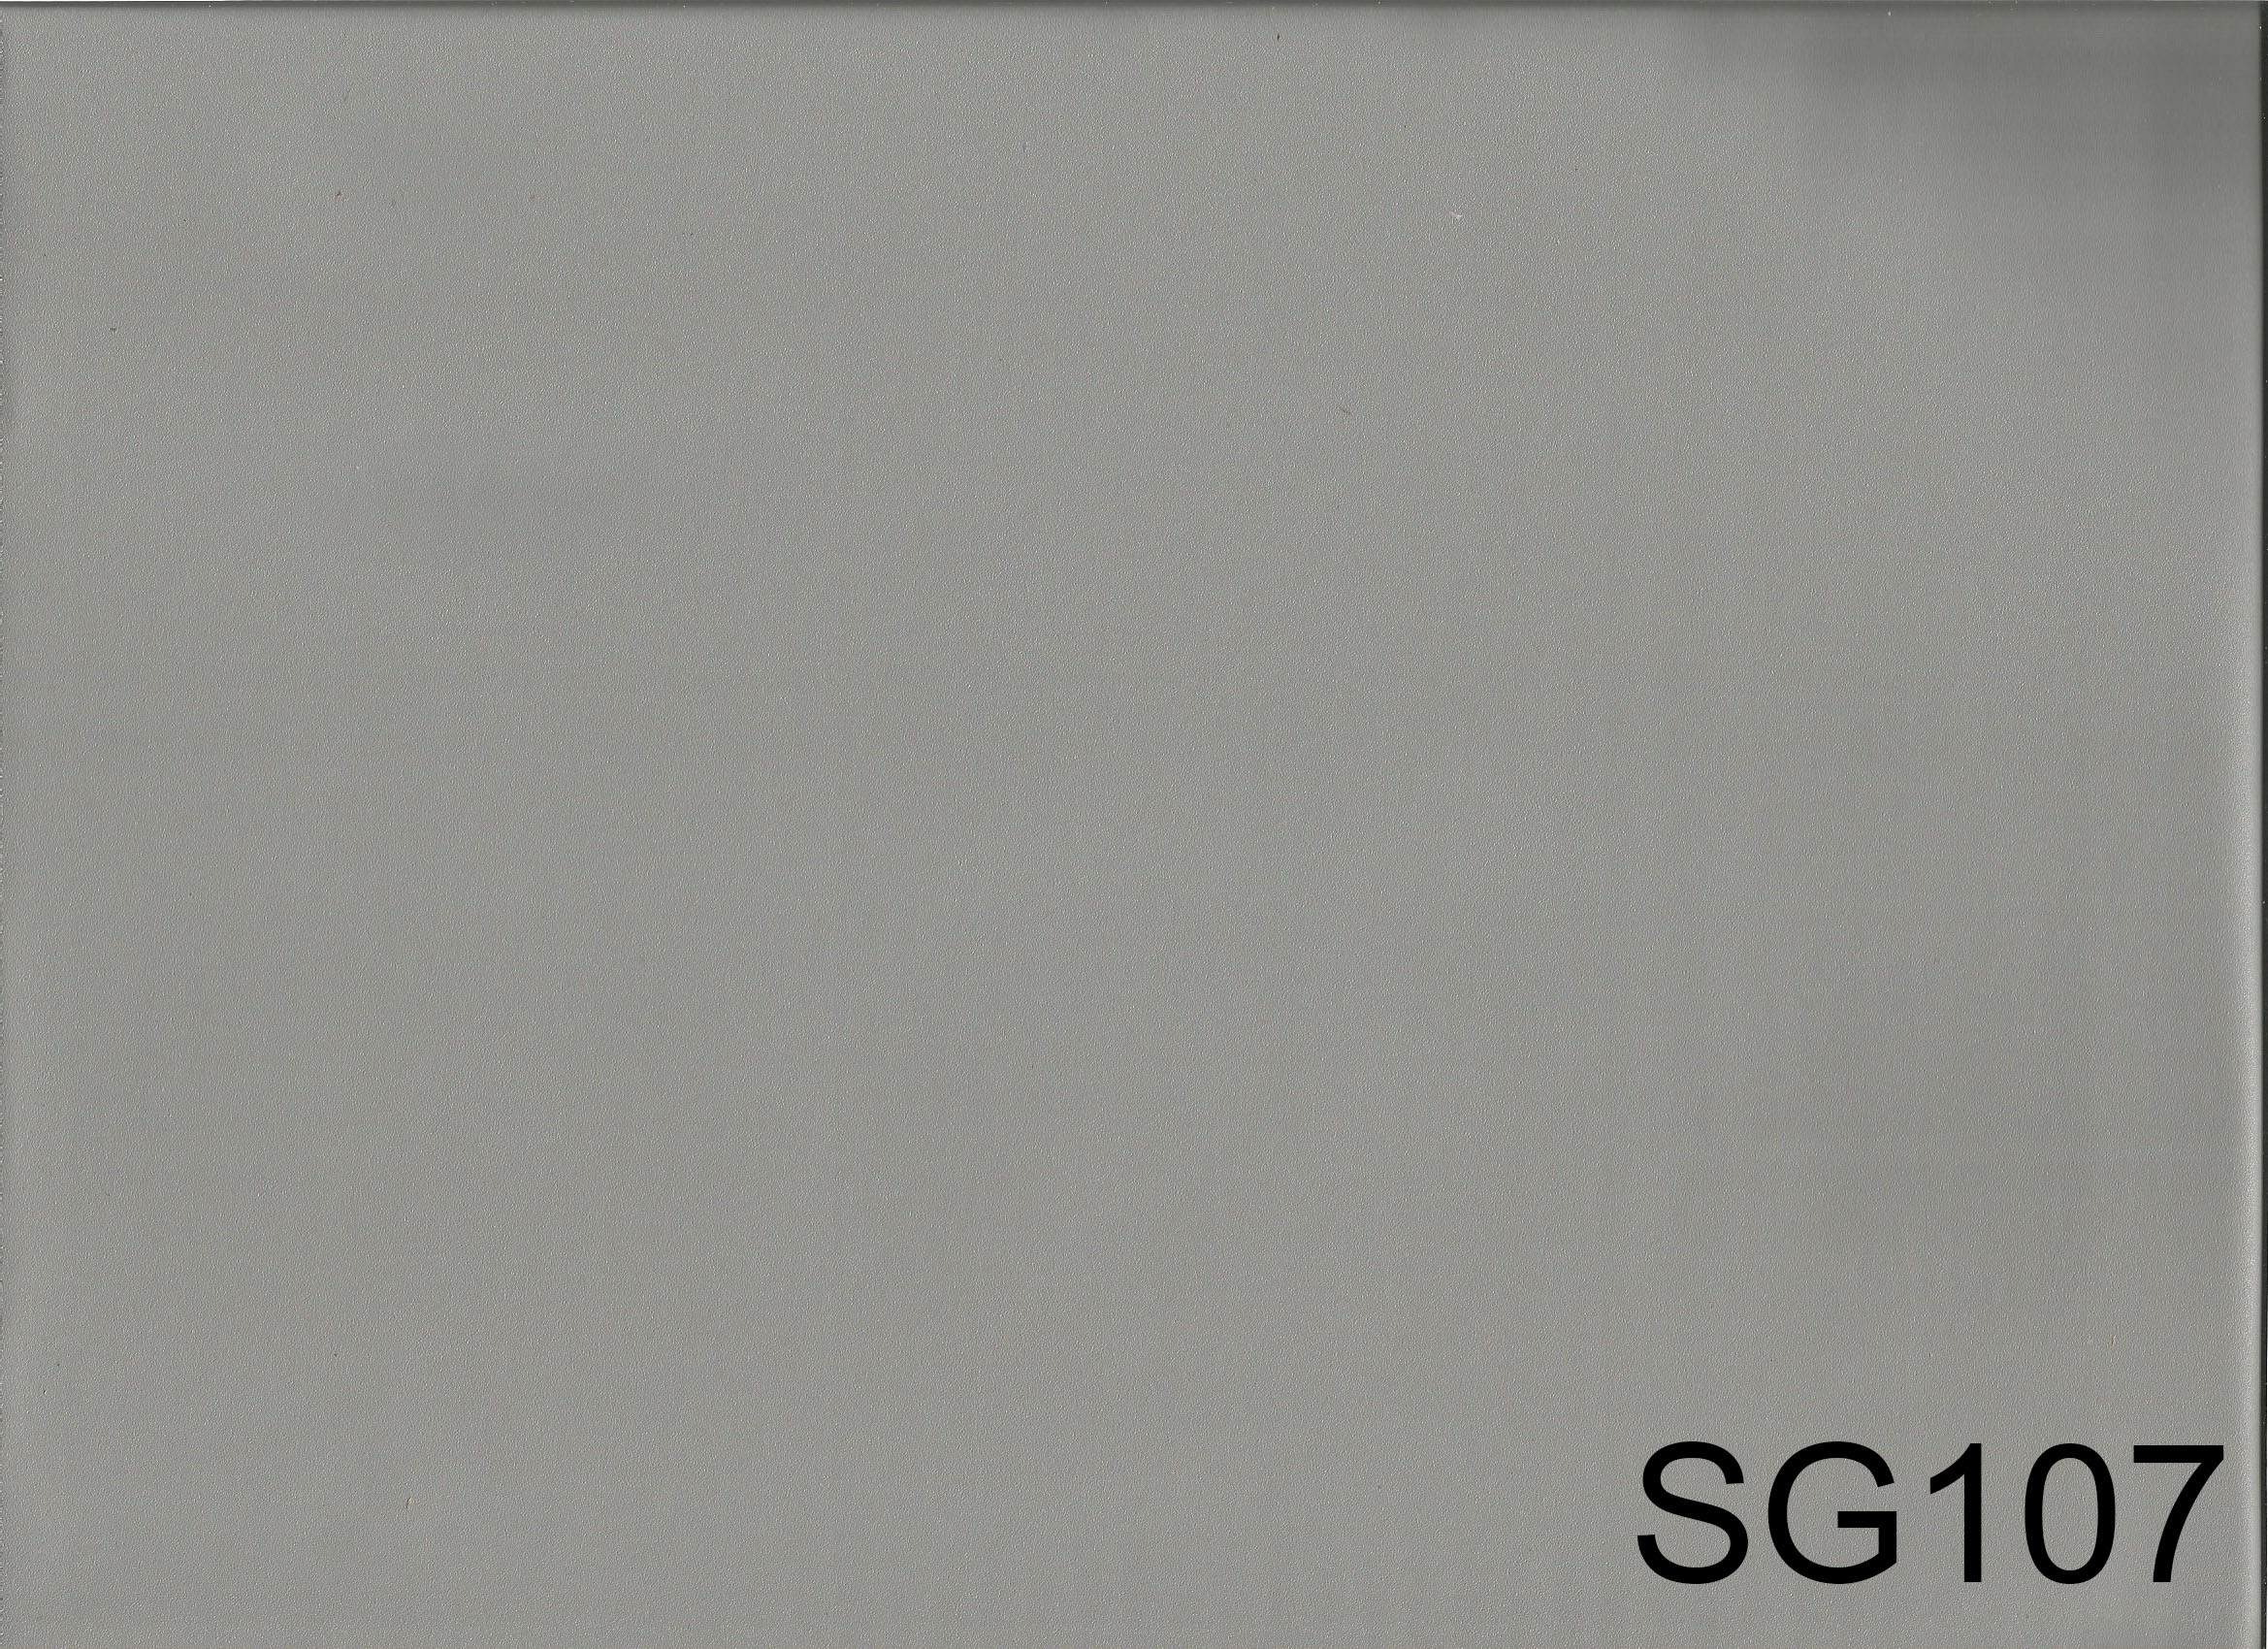 SG107